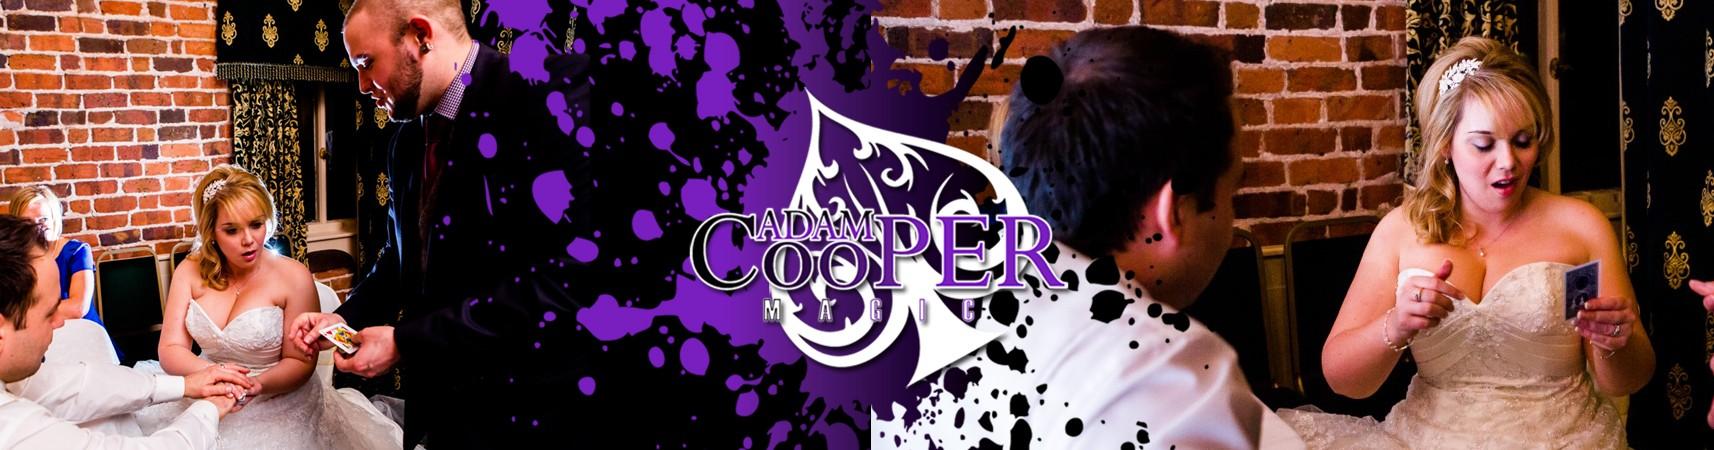 Adam Cooper,Magician,Wedding,Entertainer,Close up,West Midlands,Wolverhampton,Lichfield,Stafford,Corporate,Birmingham,Magic